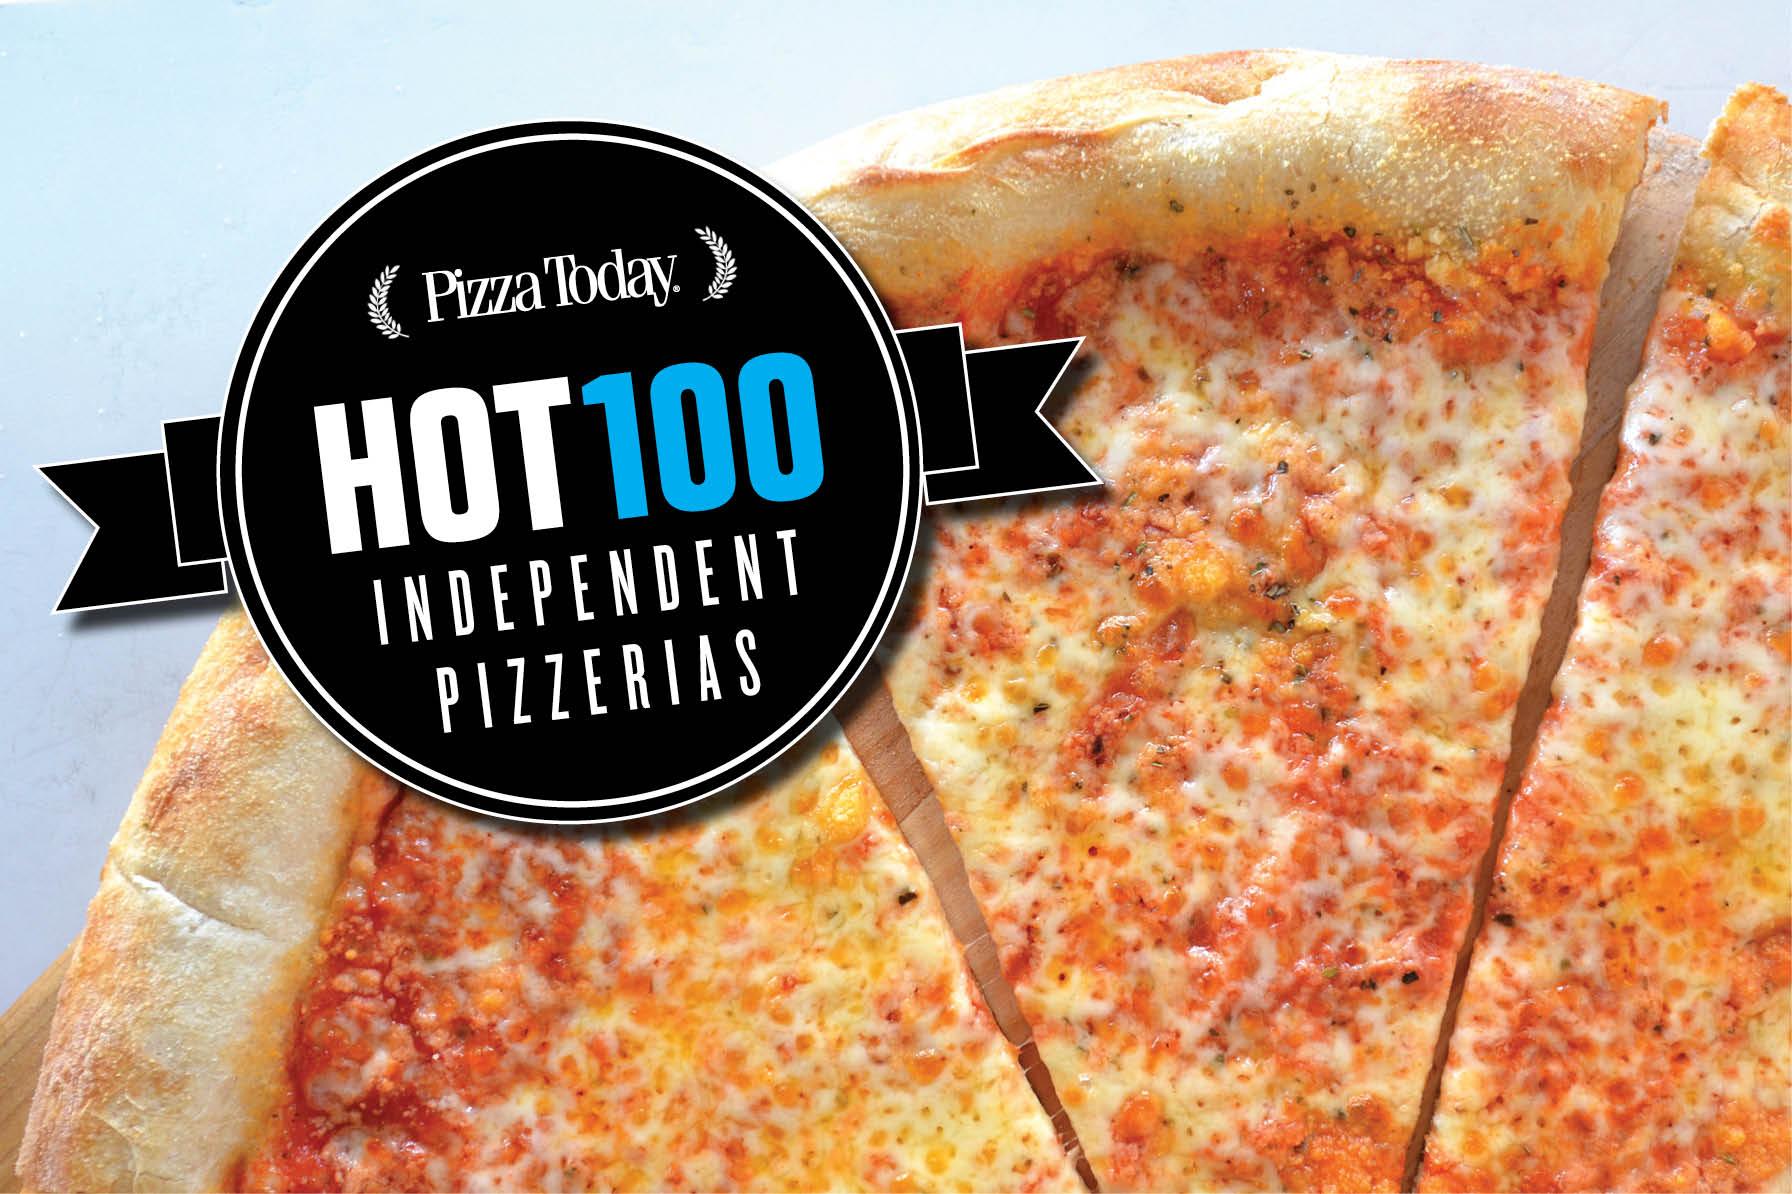 hot 100 independent pizzerias